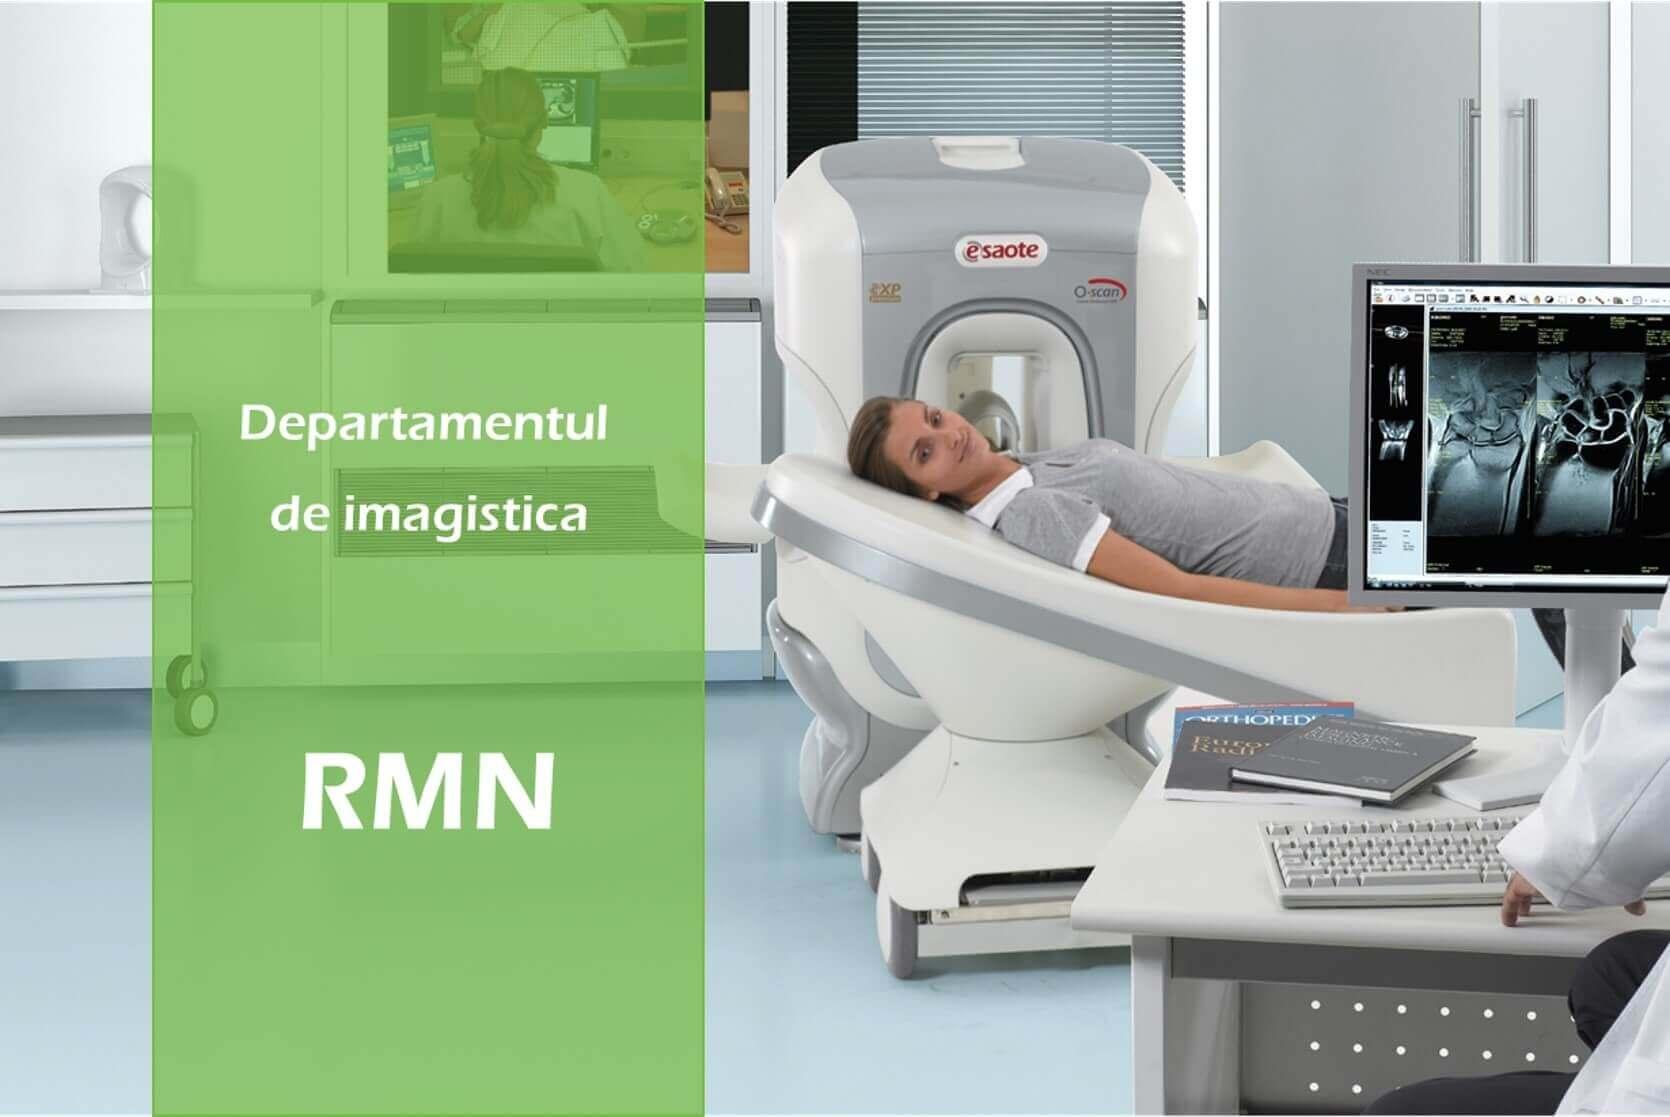 RMN Musculo-scheletal Centrokinetic